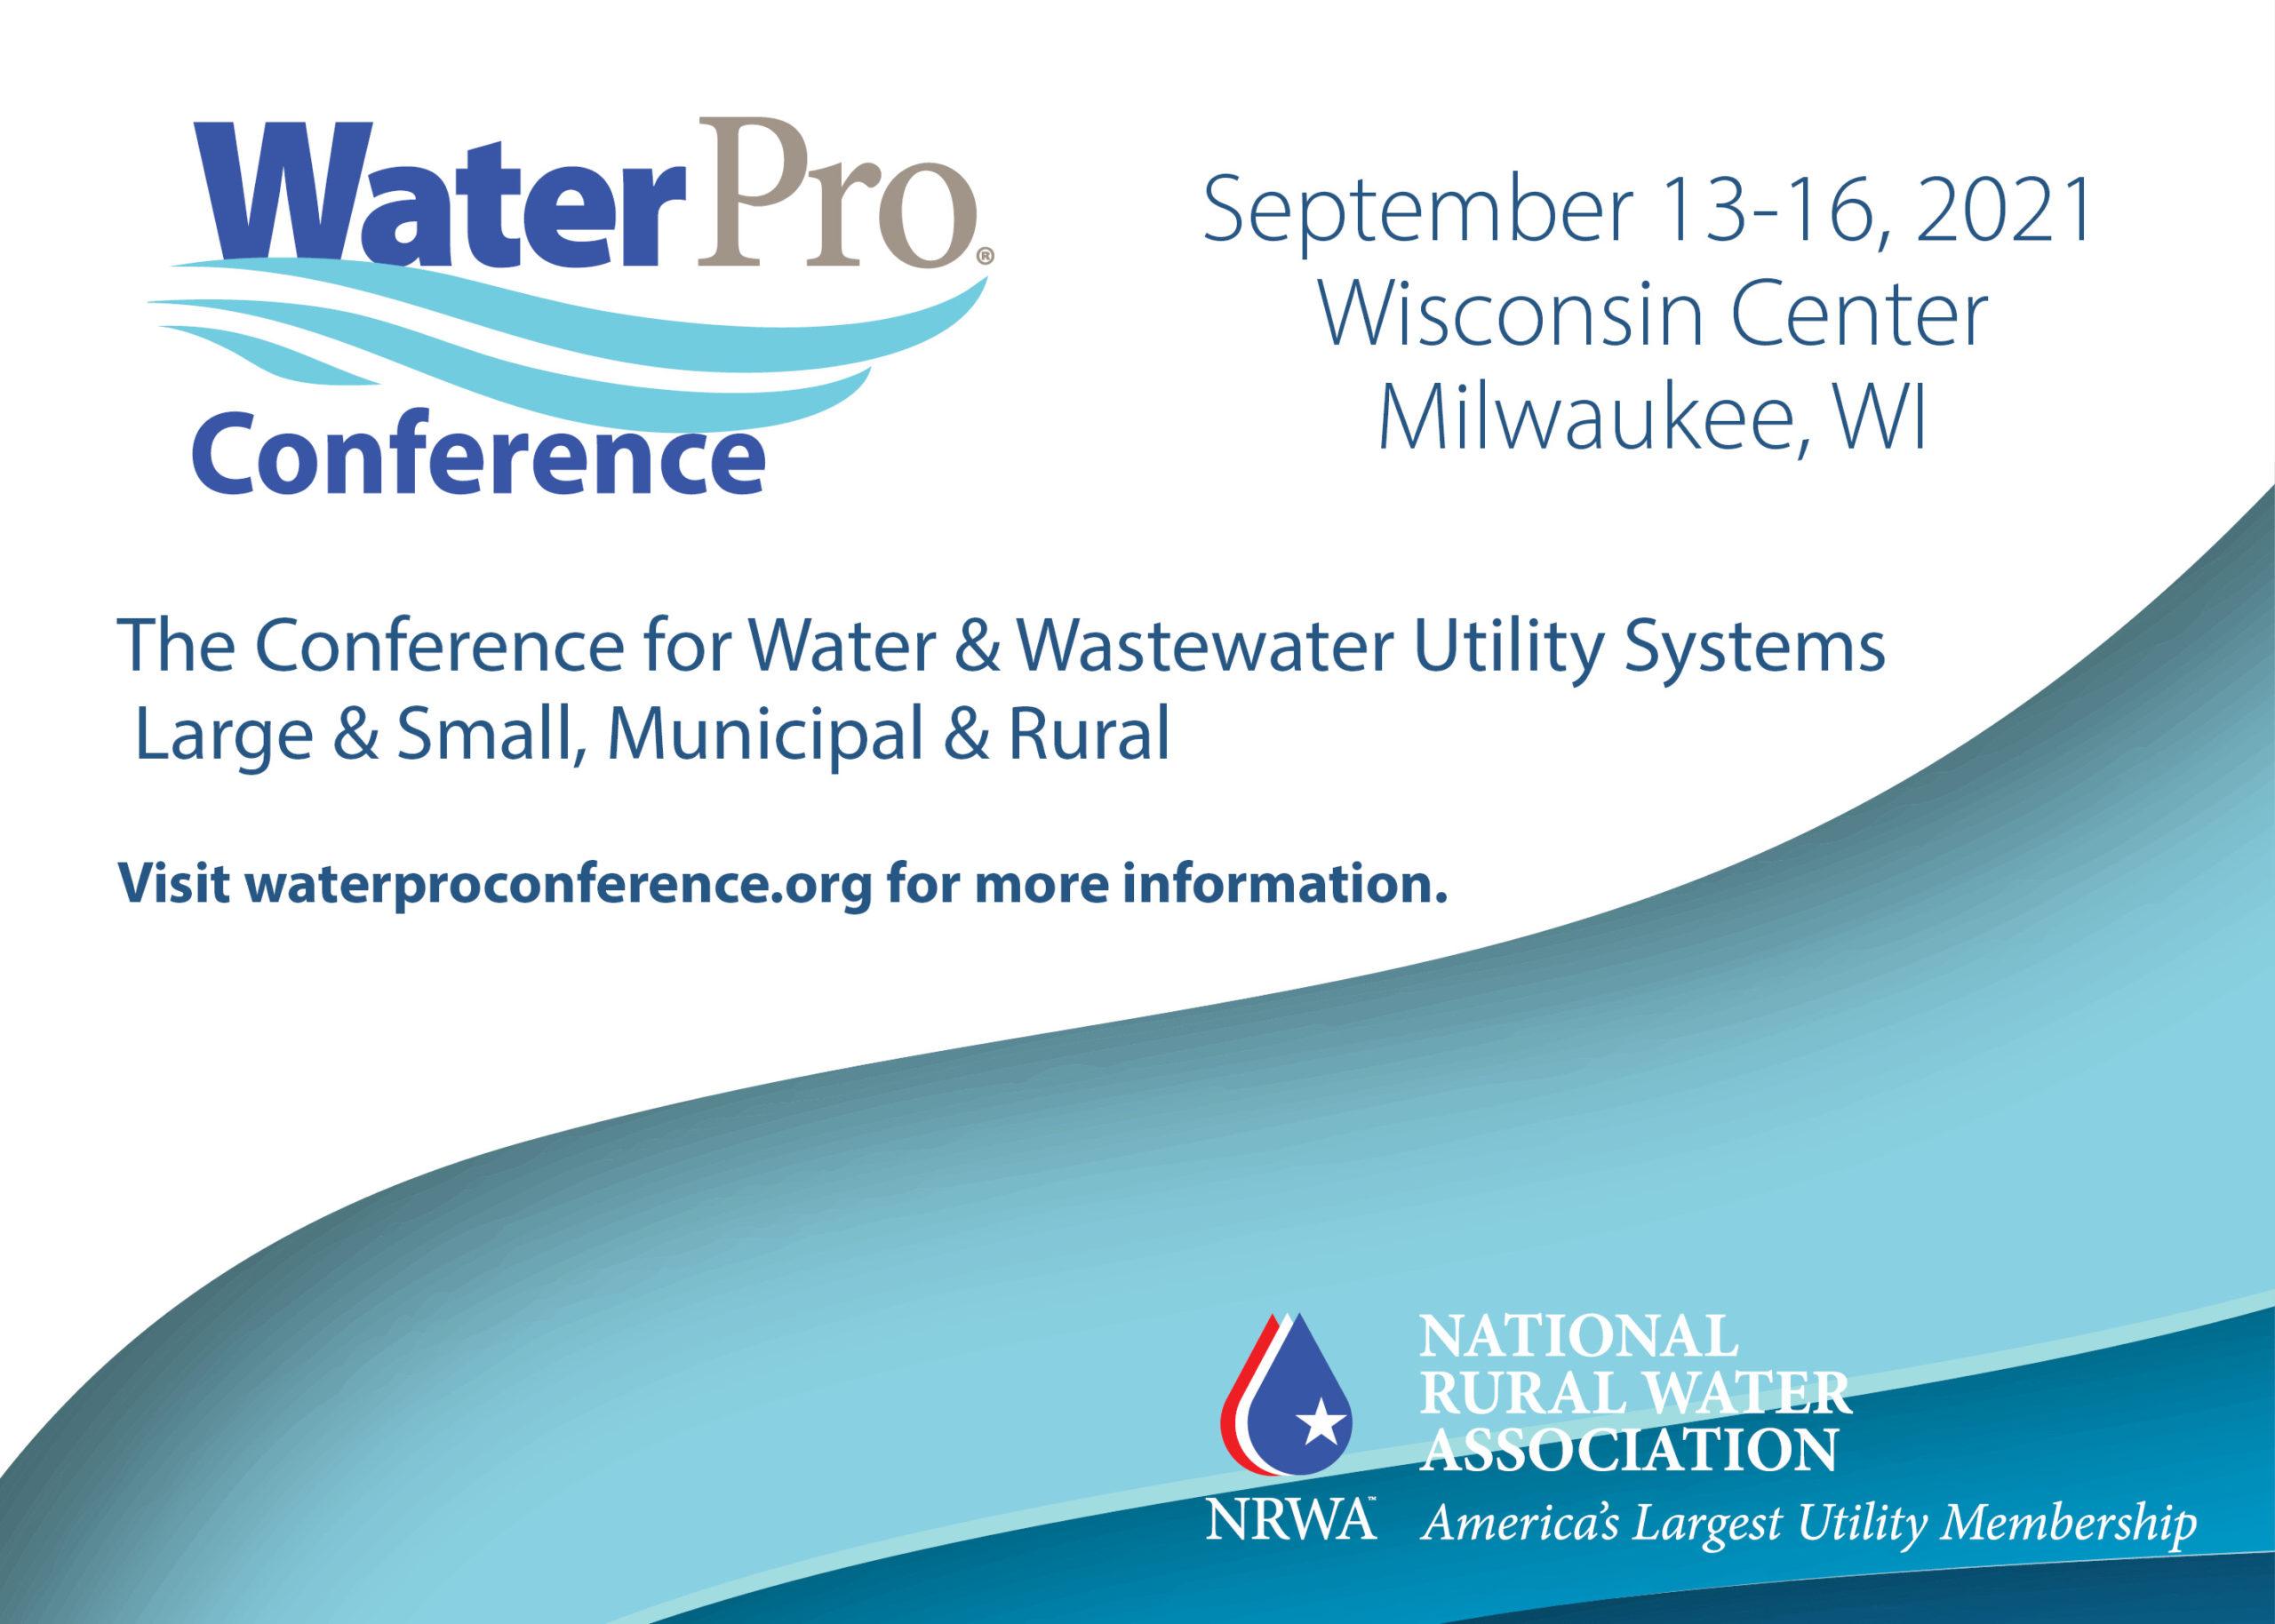 WaterPro Conference